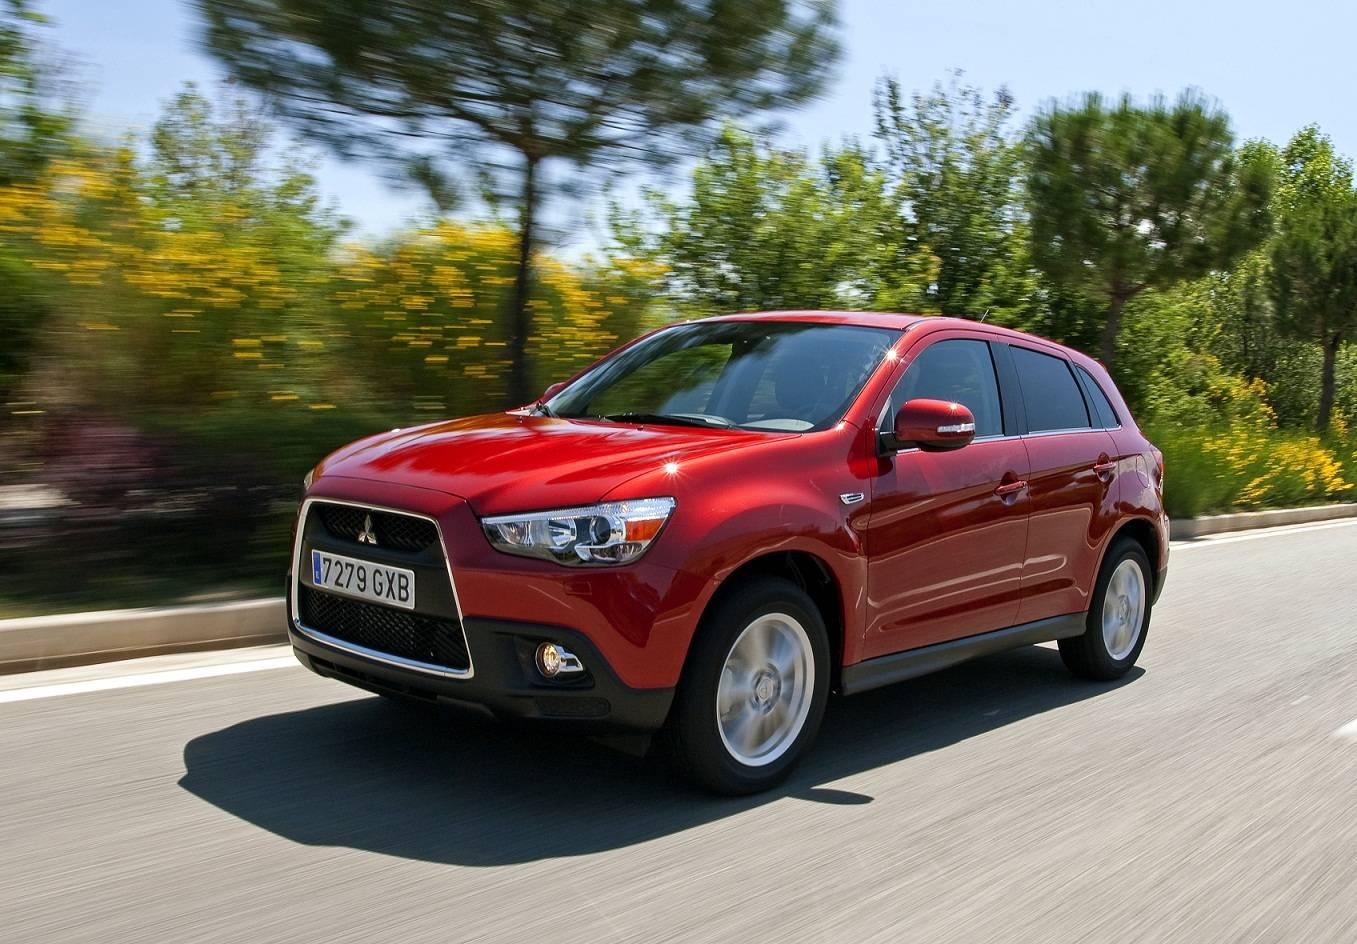 Автомобиль-парадокс: разбор проблем и недостатков Mitsubishi ASX I